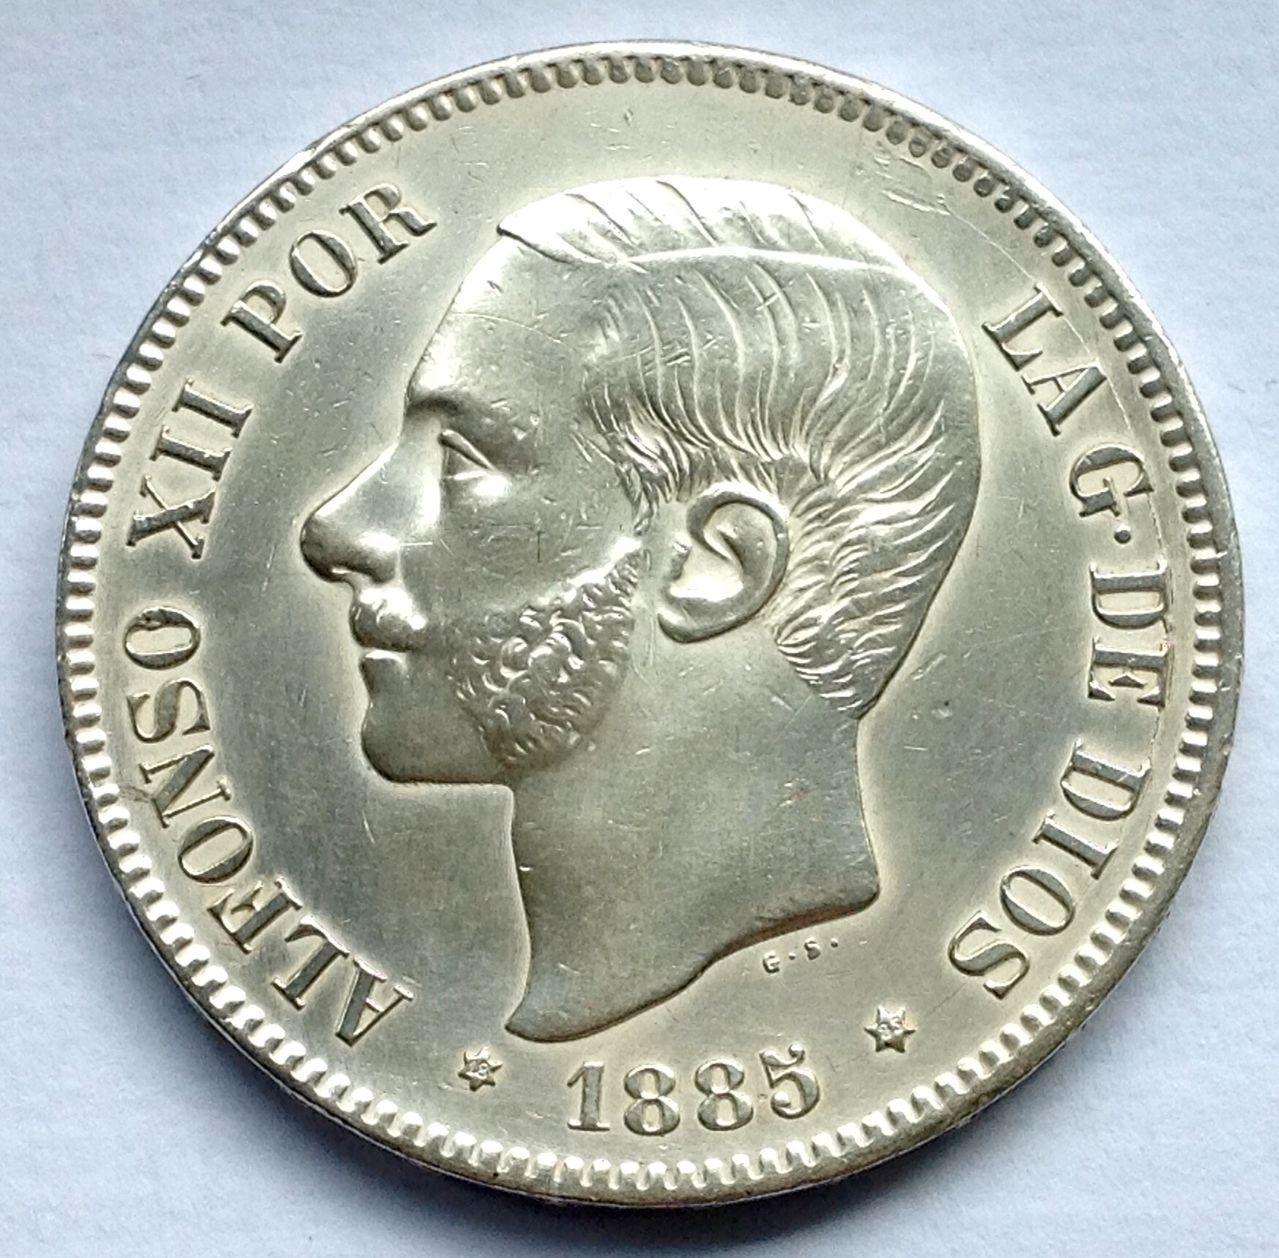 5 pesetas 1885 Alfonso XII Image